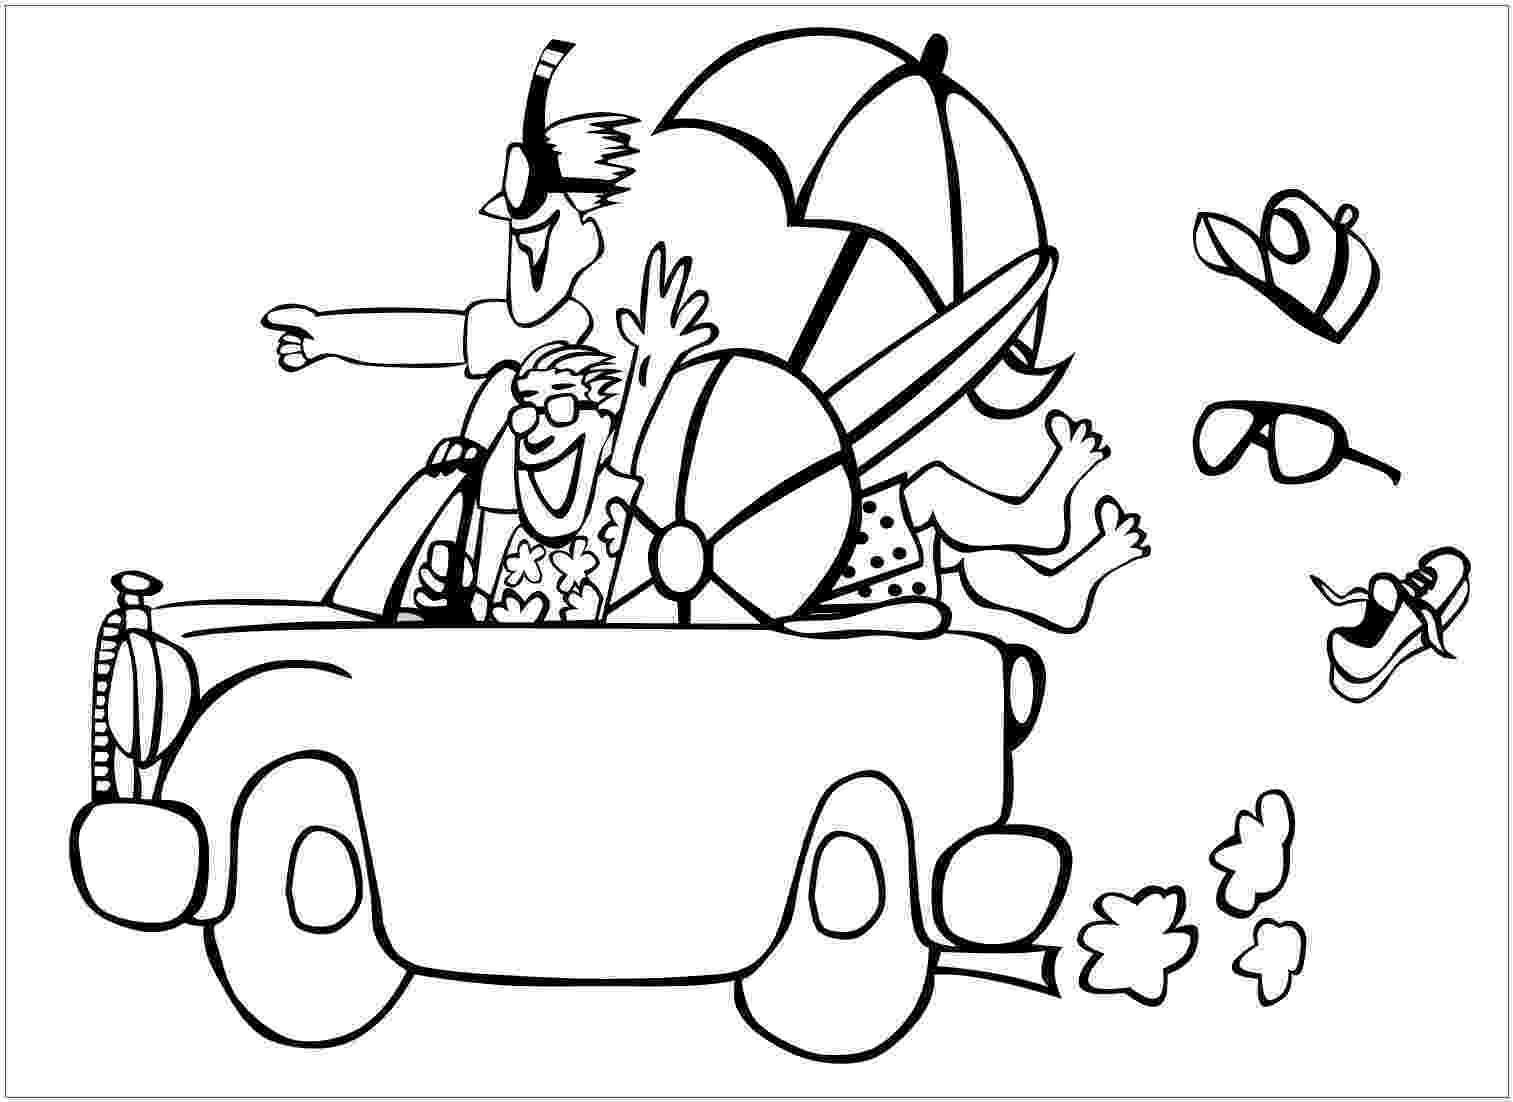 summer coloring sheets download free printable summer coloring pages for kids summer coloring sheets